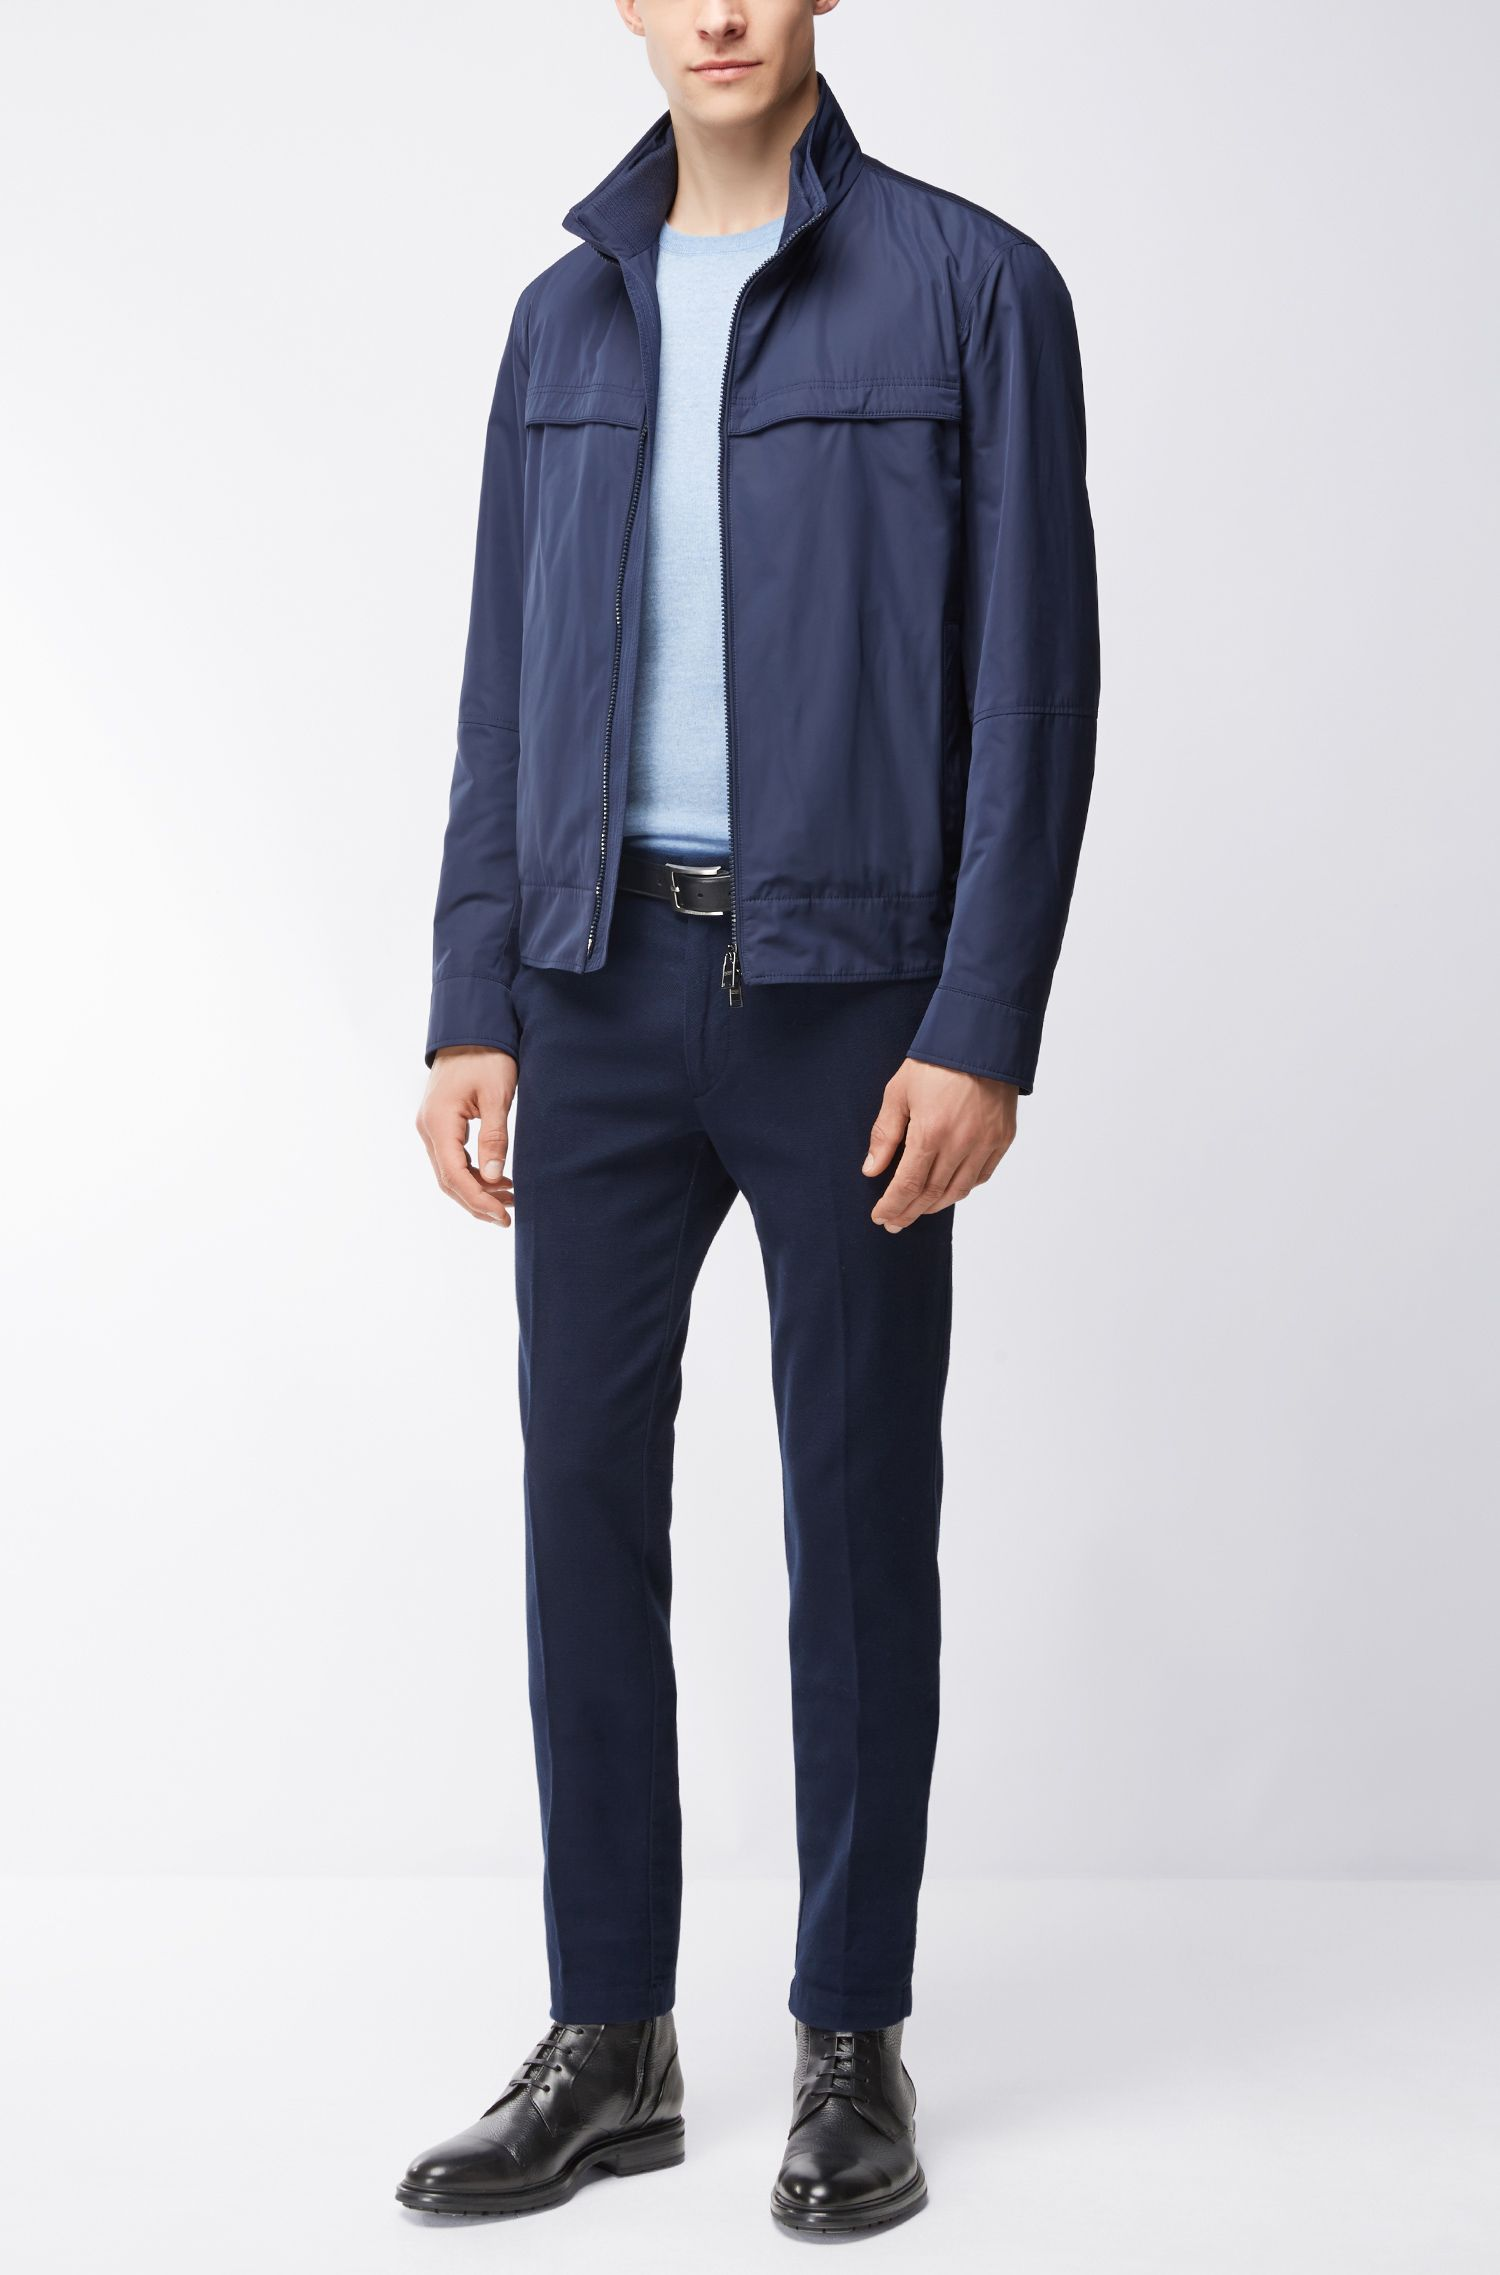 Extra-Fine Merino Wool Sweater | Leno N, Dark Blue